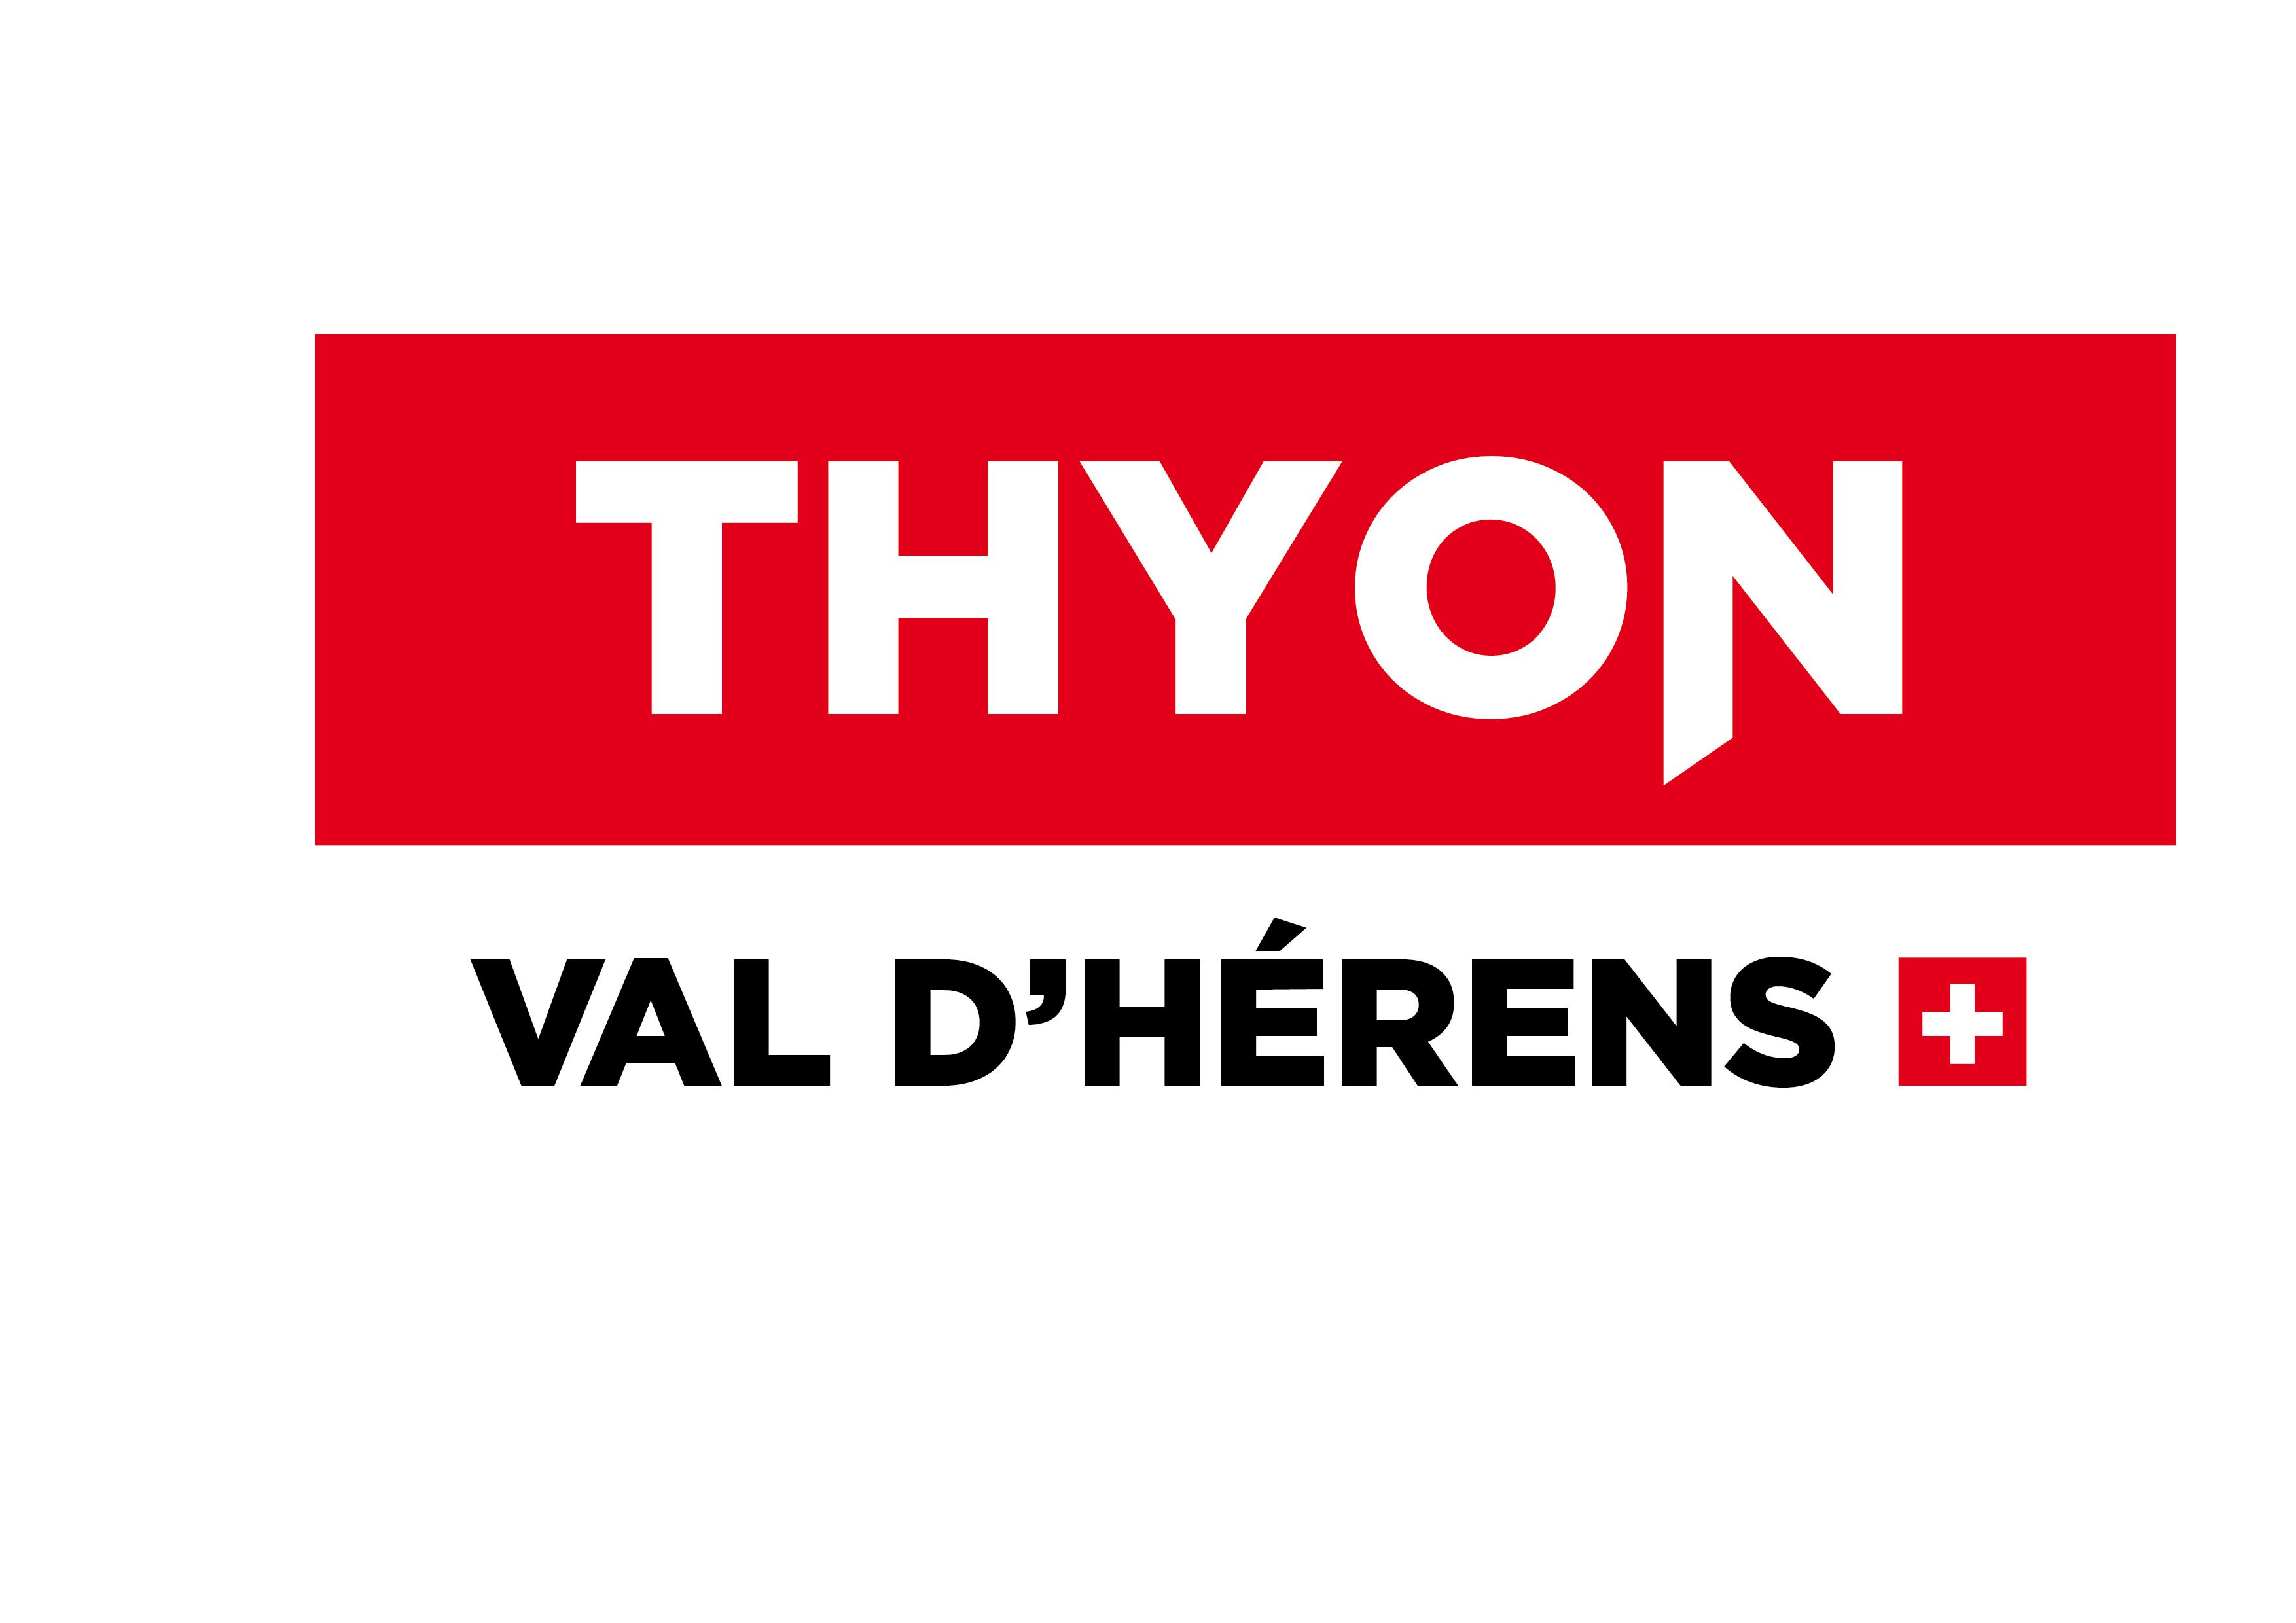 Thyon4valees